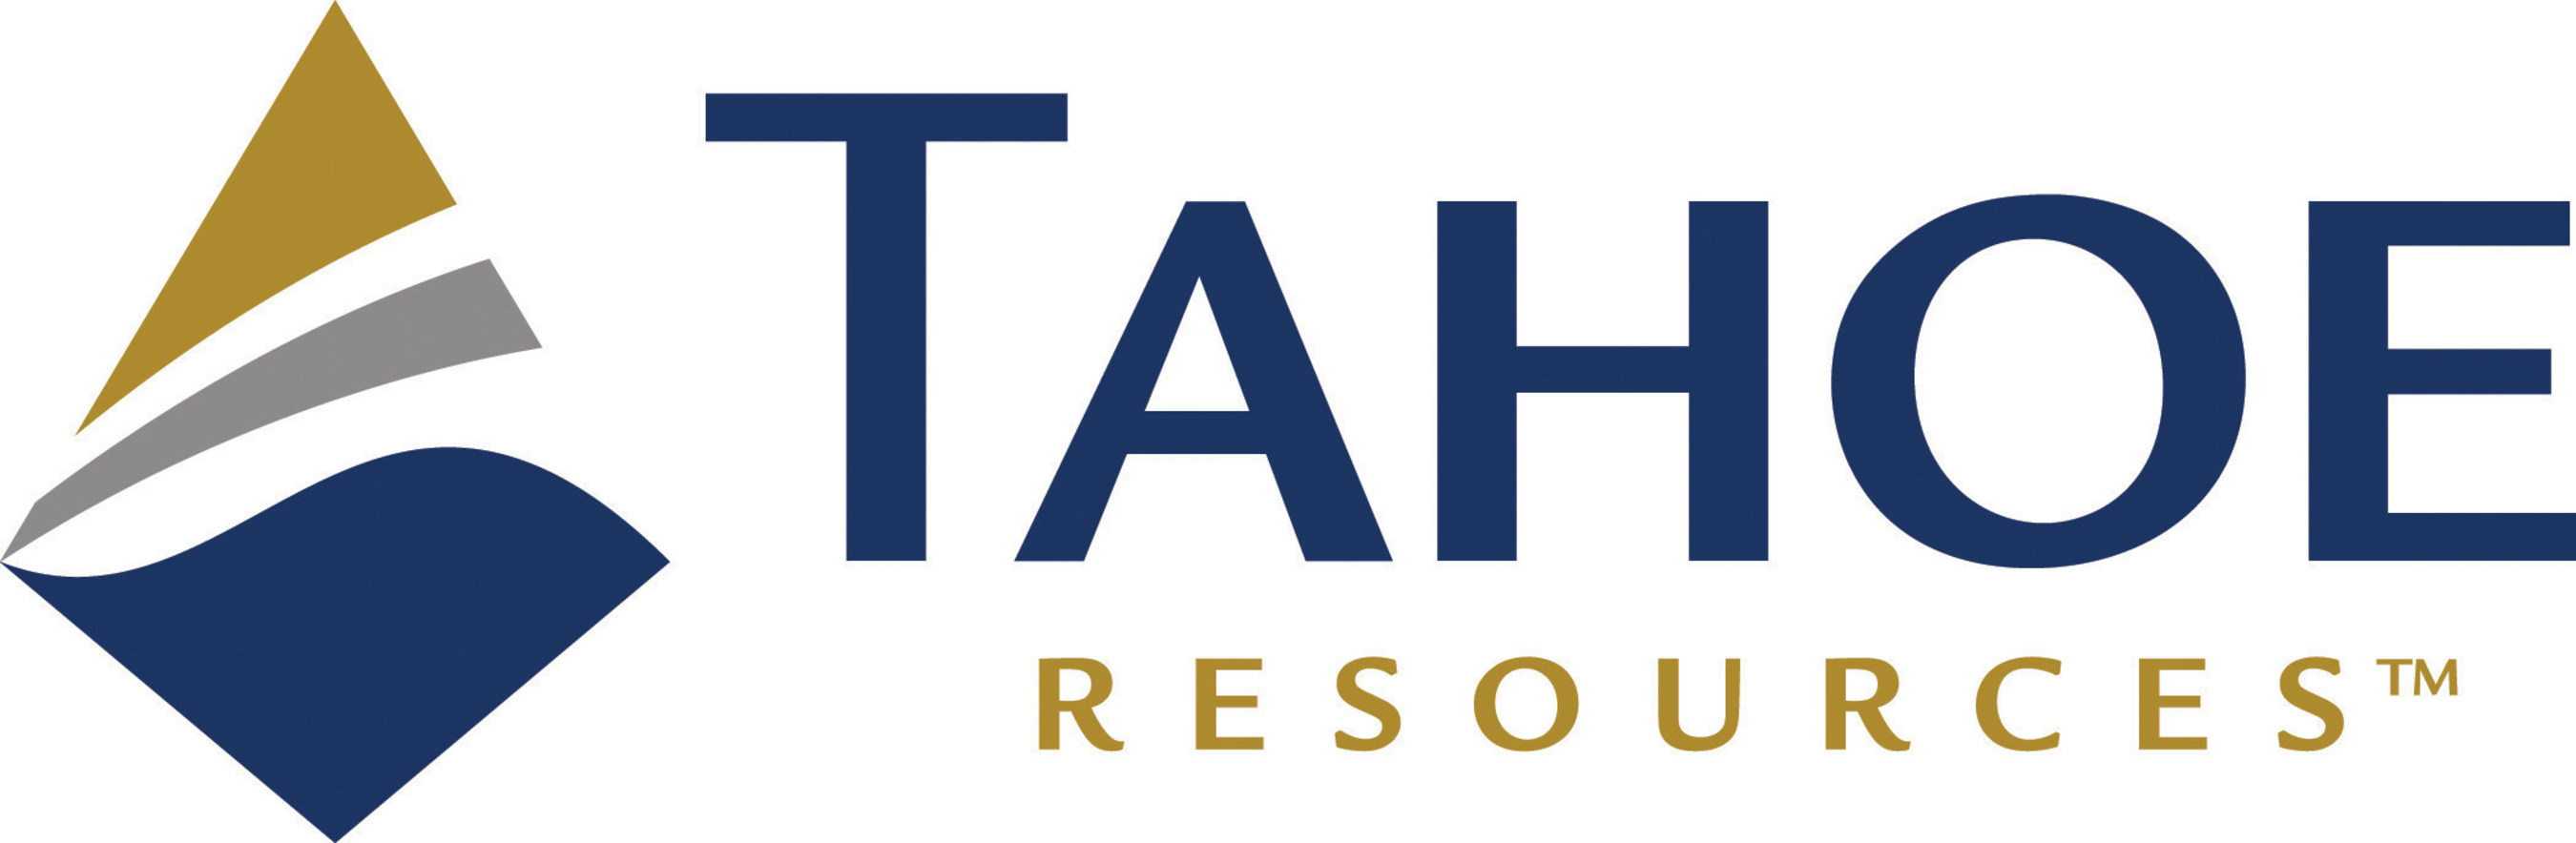 New Tahoe Logo (PRNewsFoto/Tahoe Resources Inc.)